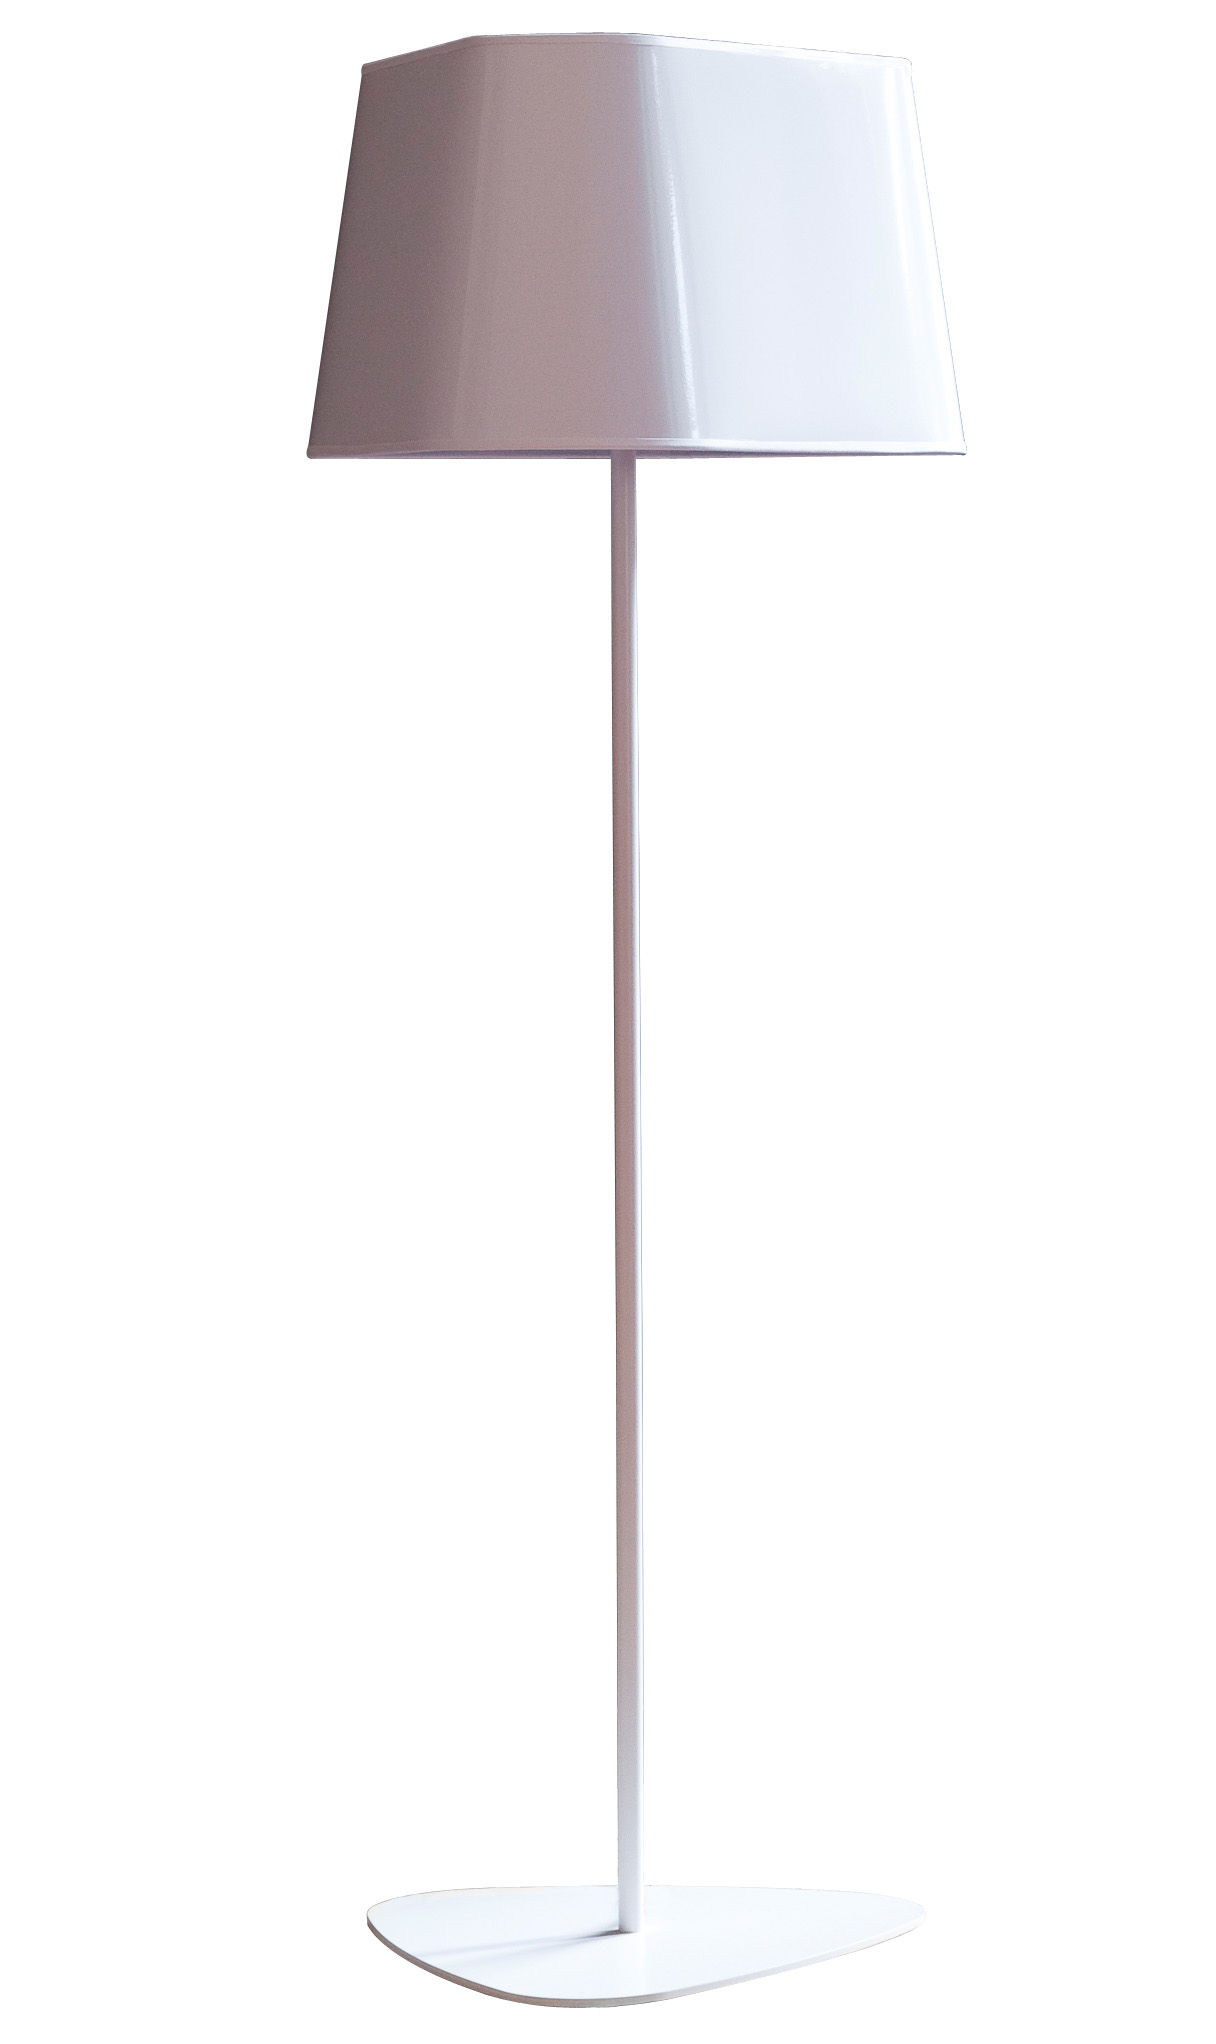 Luminaire - Lampadaires - Lampadaire Grand Nuage H 122 cm - Designheure - Tissu blanc uni - Acier laqué, Percaline de coton